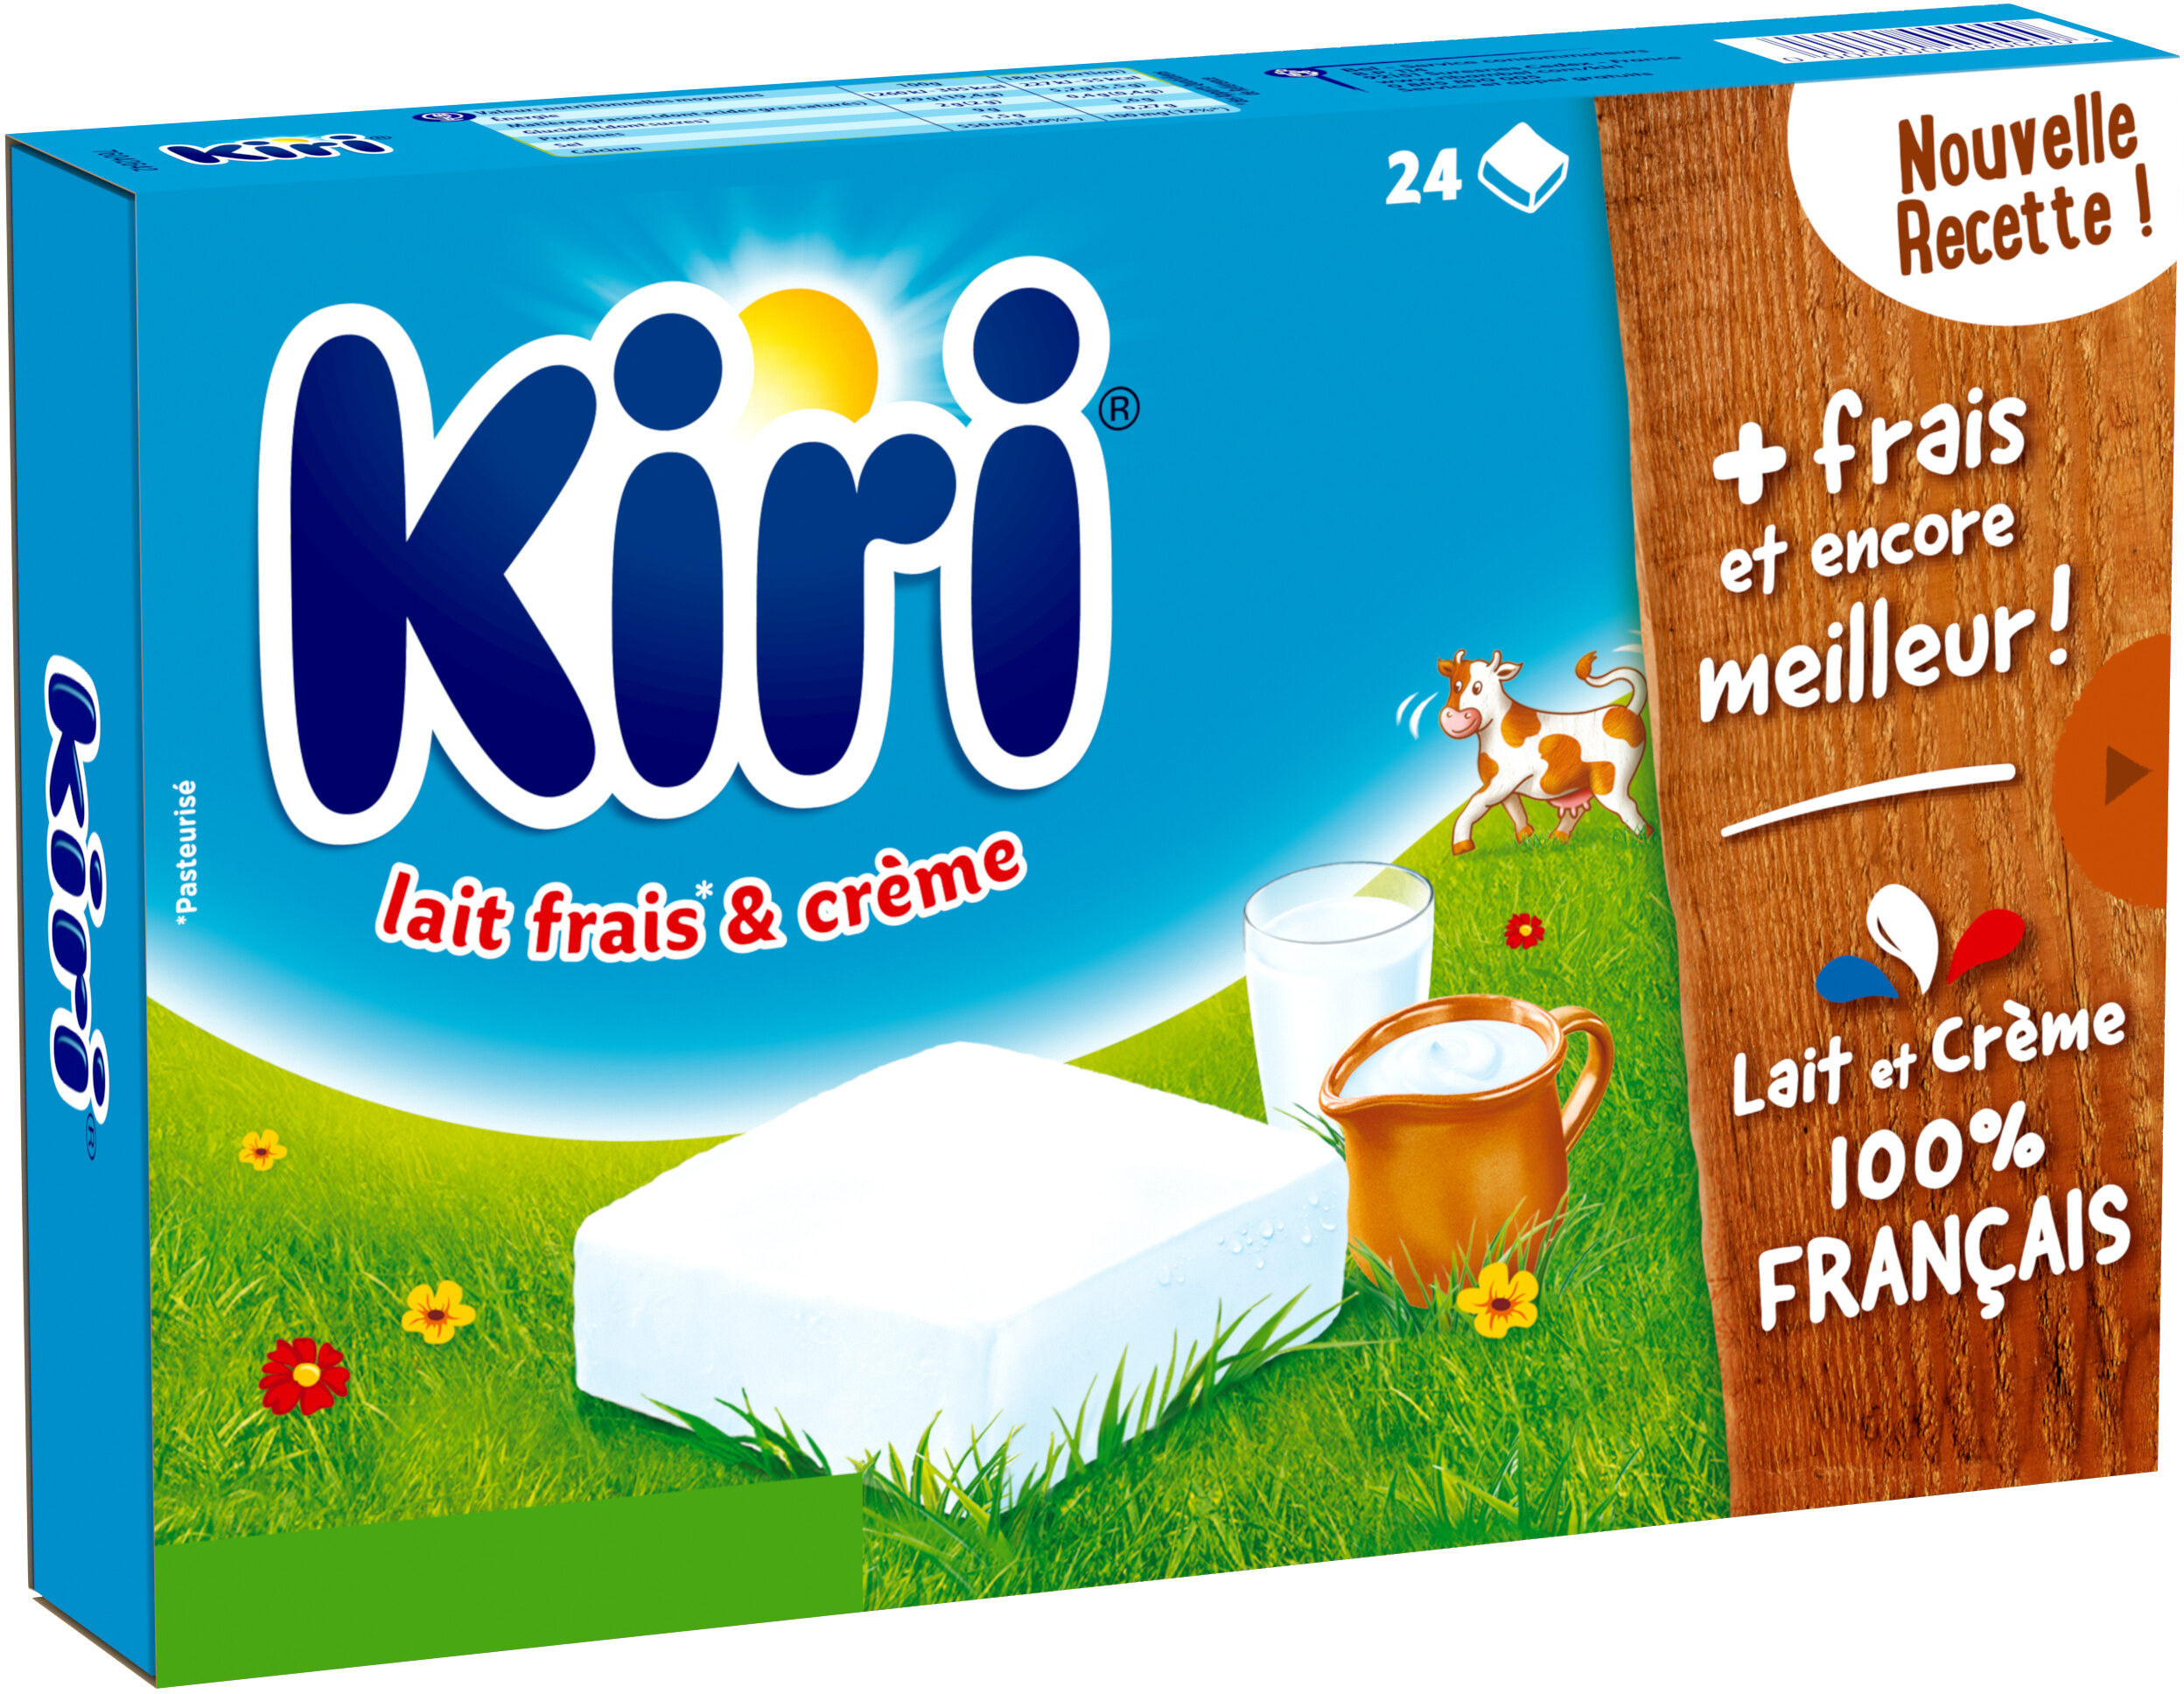 Kiri creme - 24p - Produit - fr